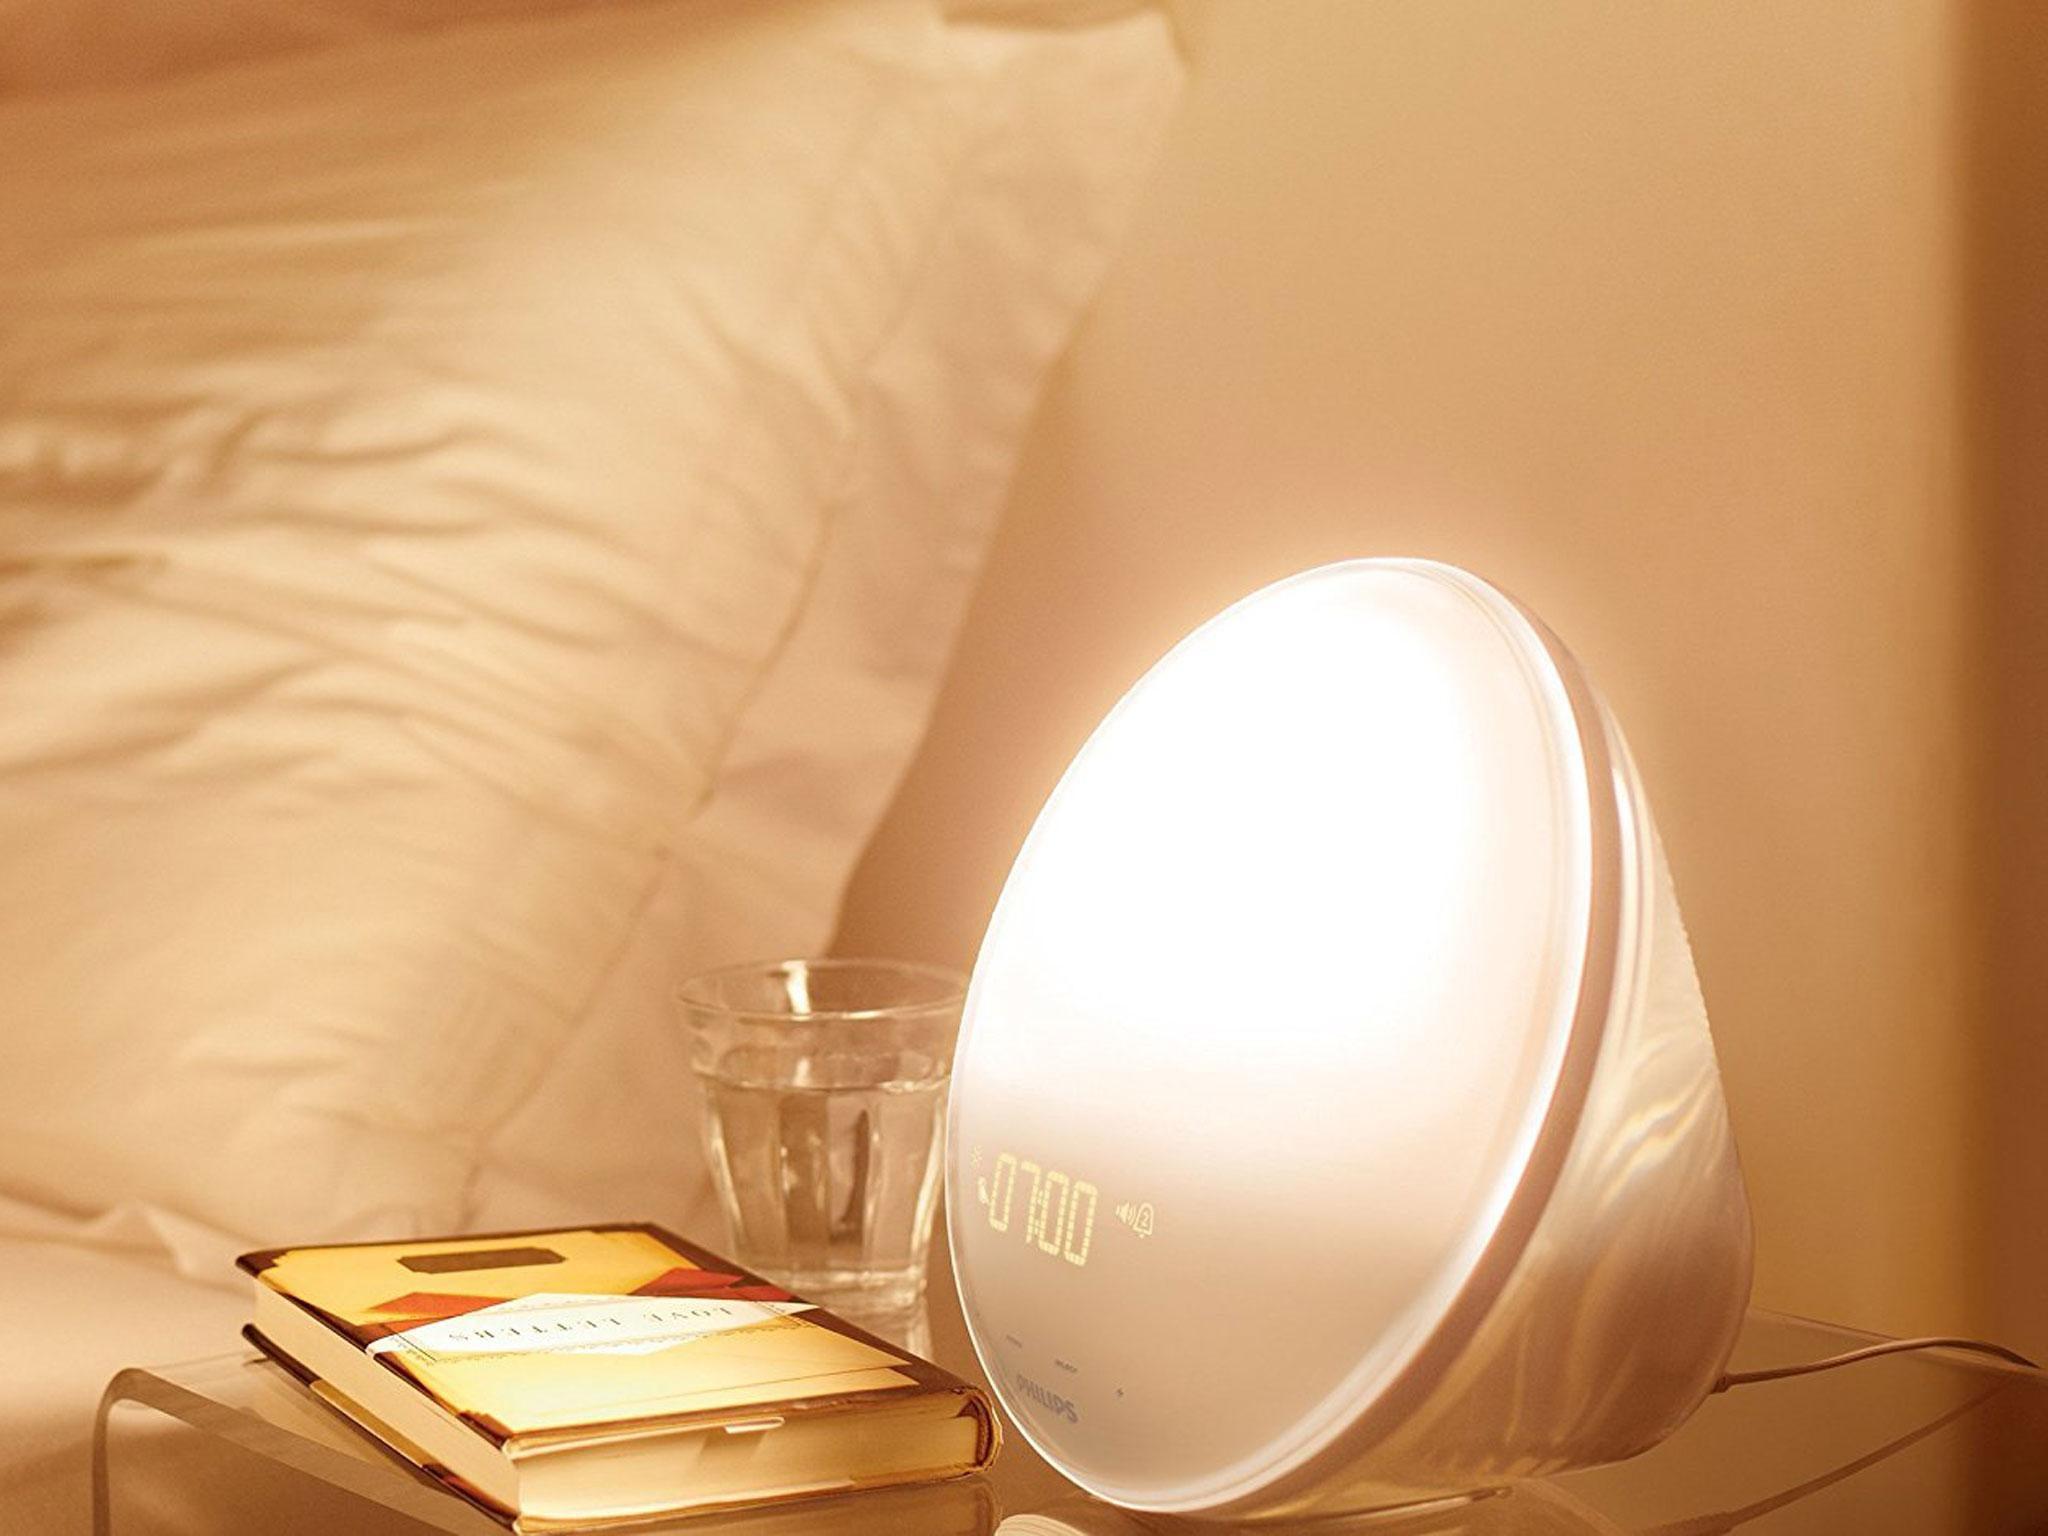 7 best wake up light alarm clocks | The Independent